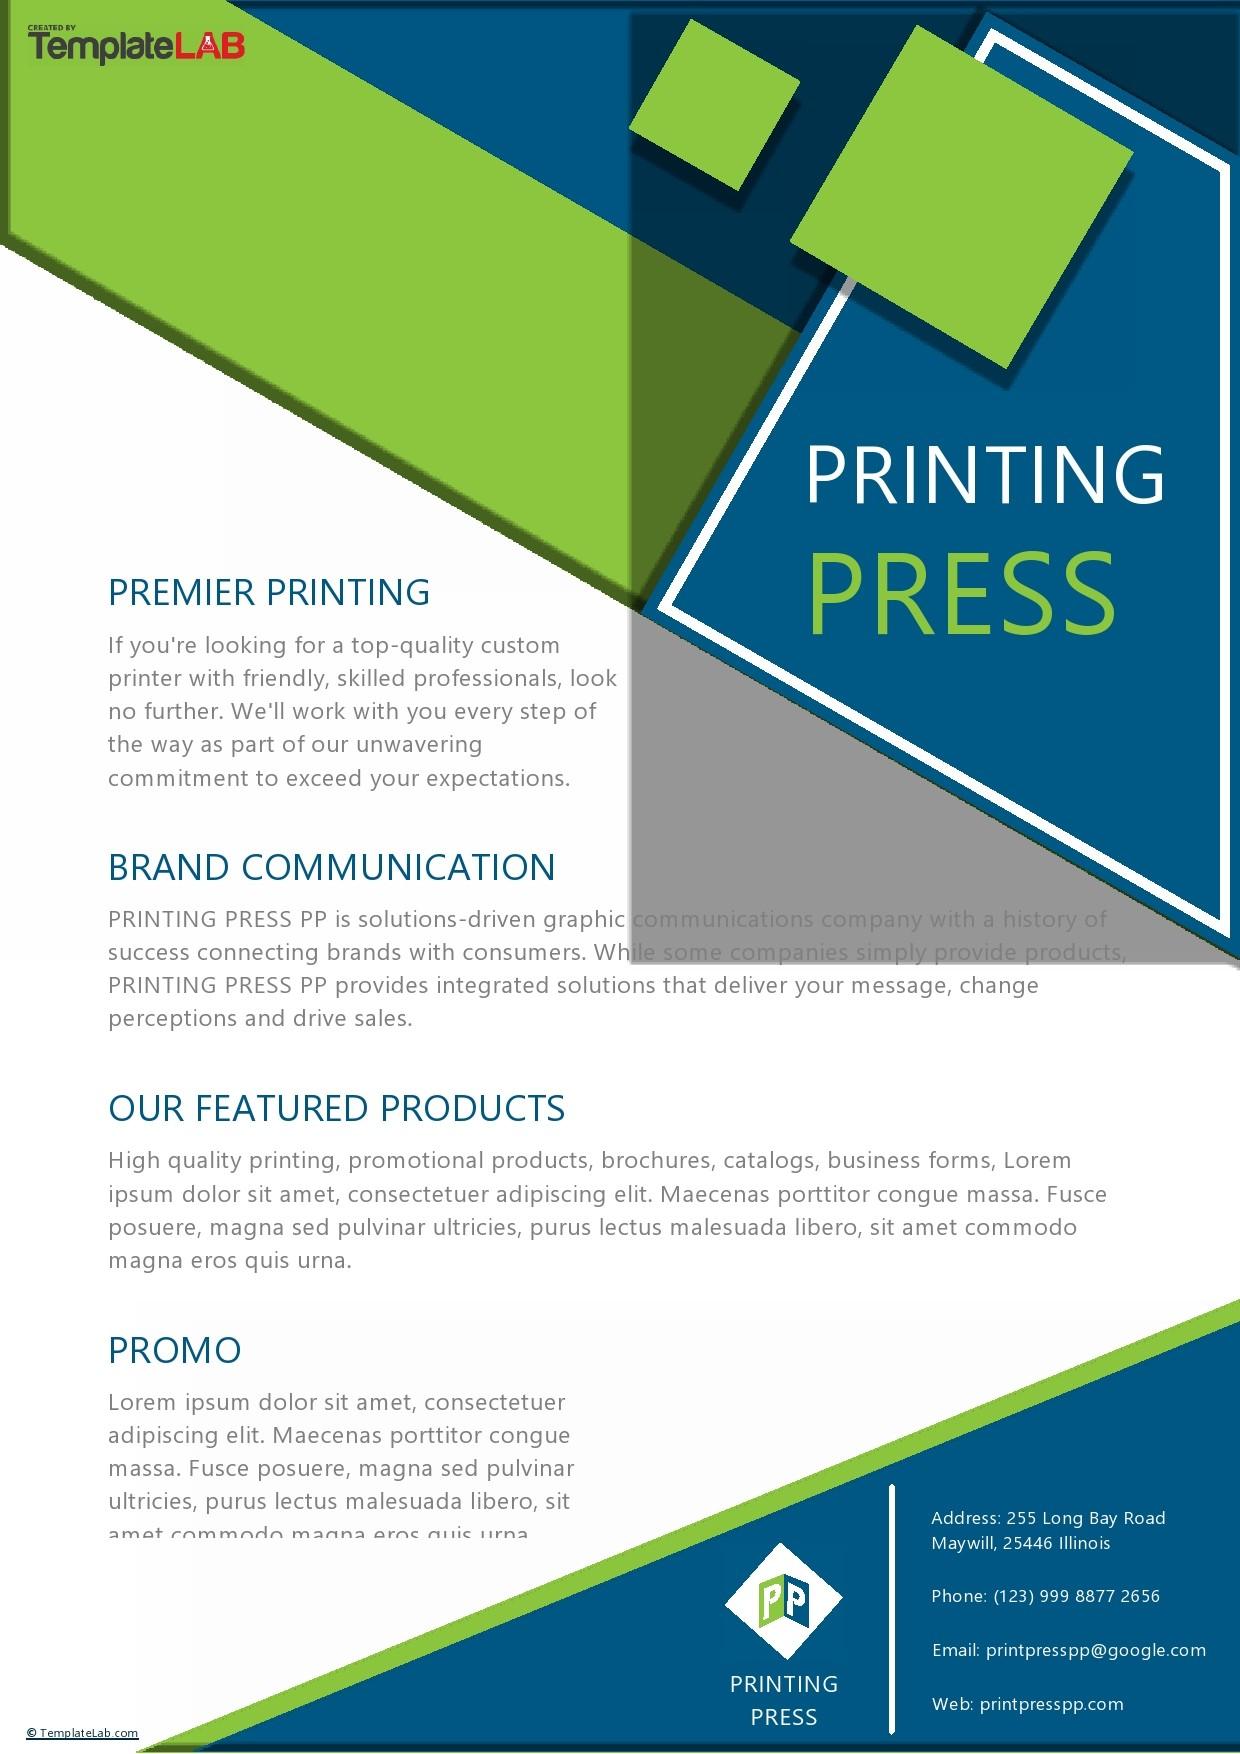 Free Printing Press Company Profile Template - TemplateLab.com